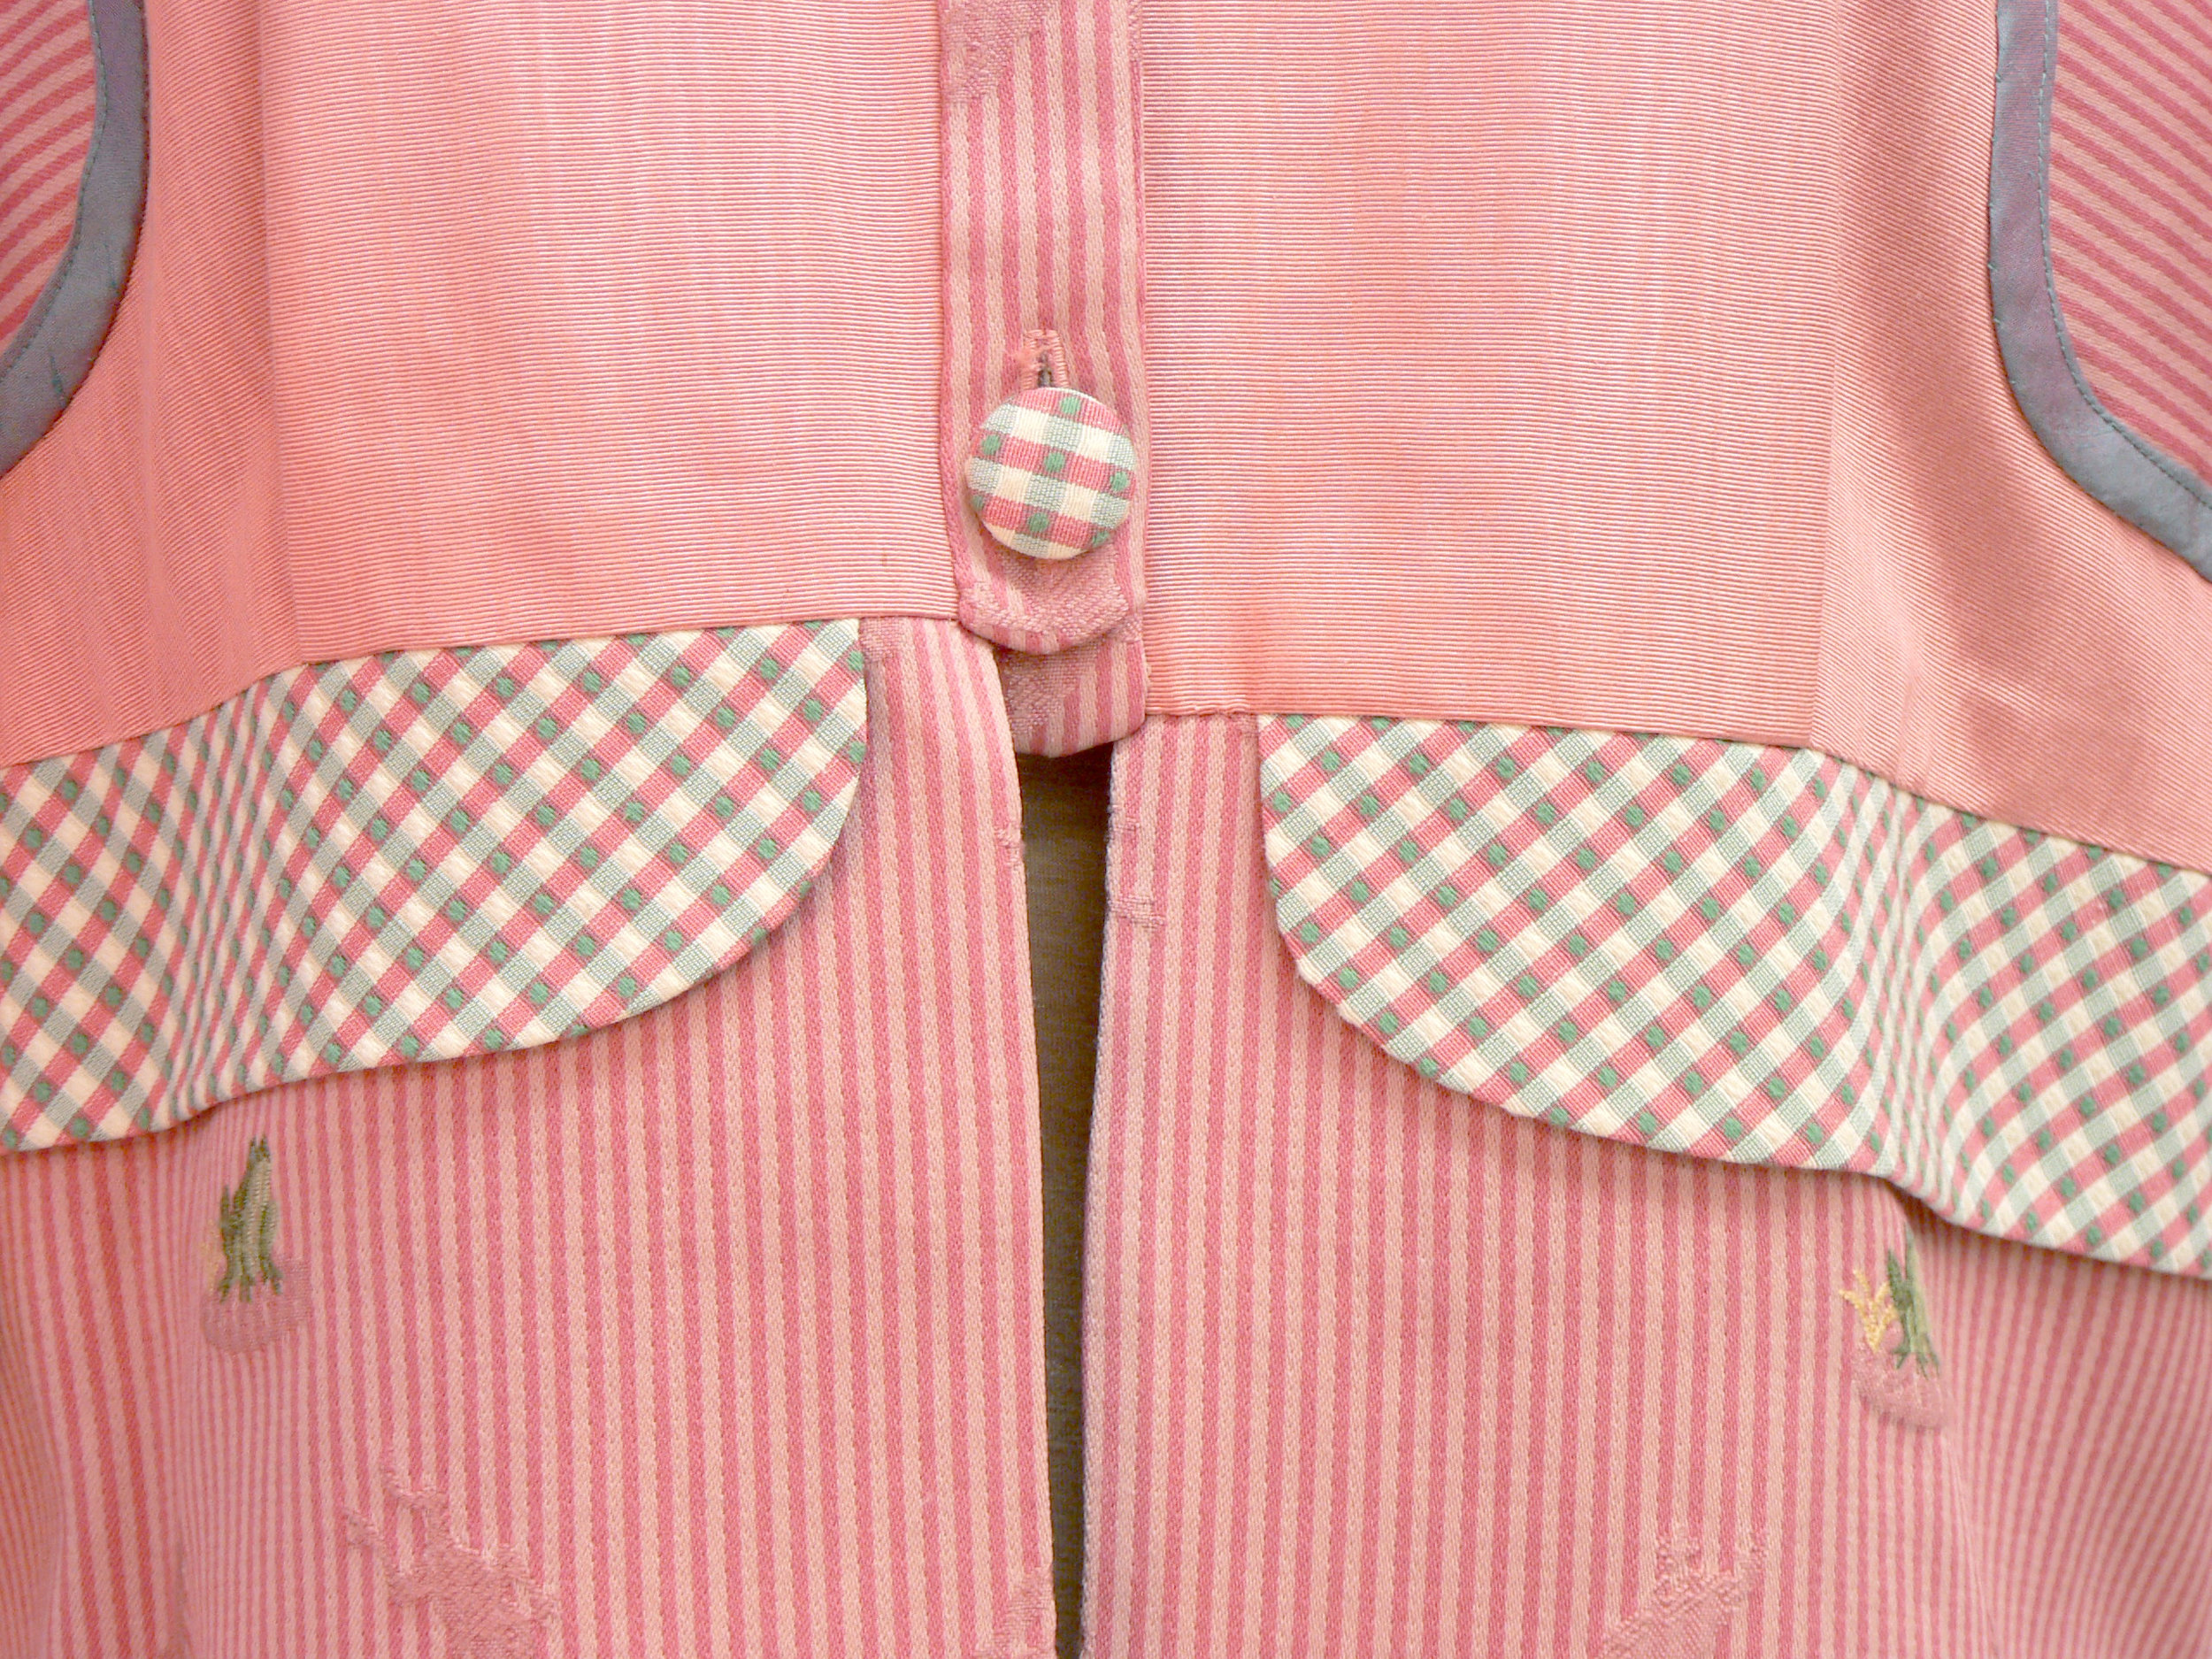 jacket14_fabric_detail1.jpg